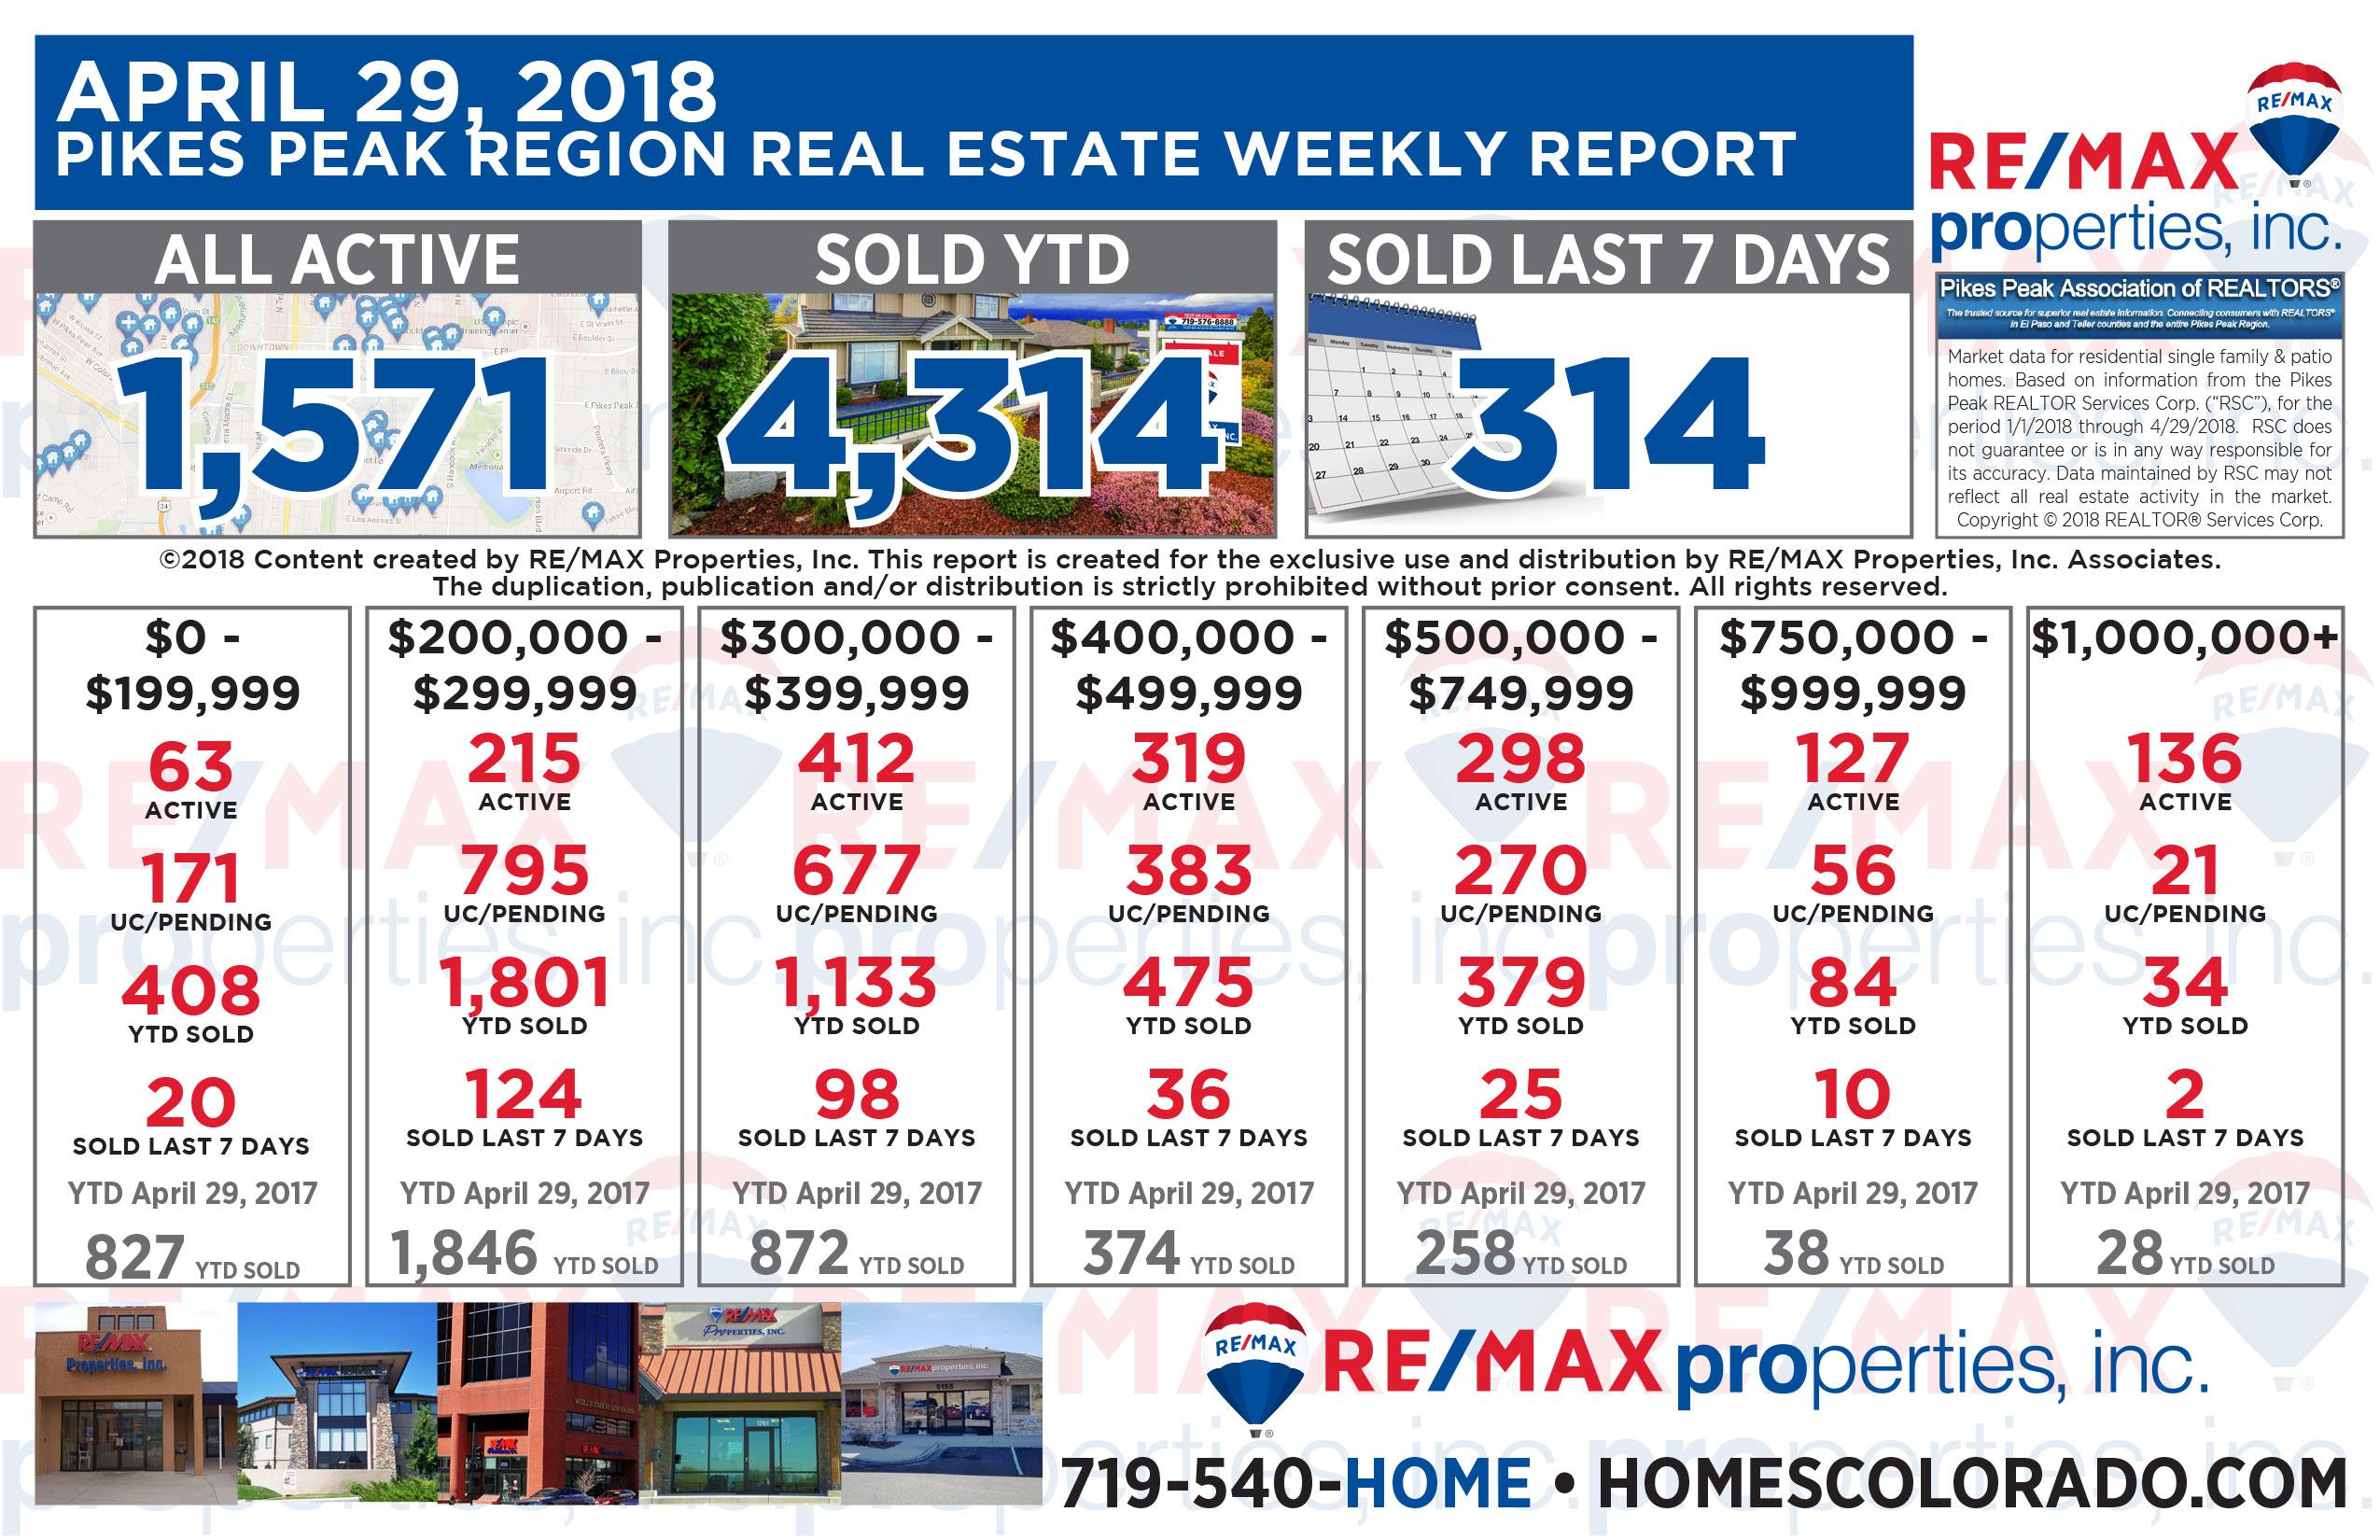 April 29 2018 Pikes Peak Region Weekly Real Estate Market Report